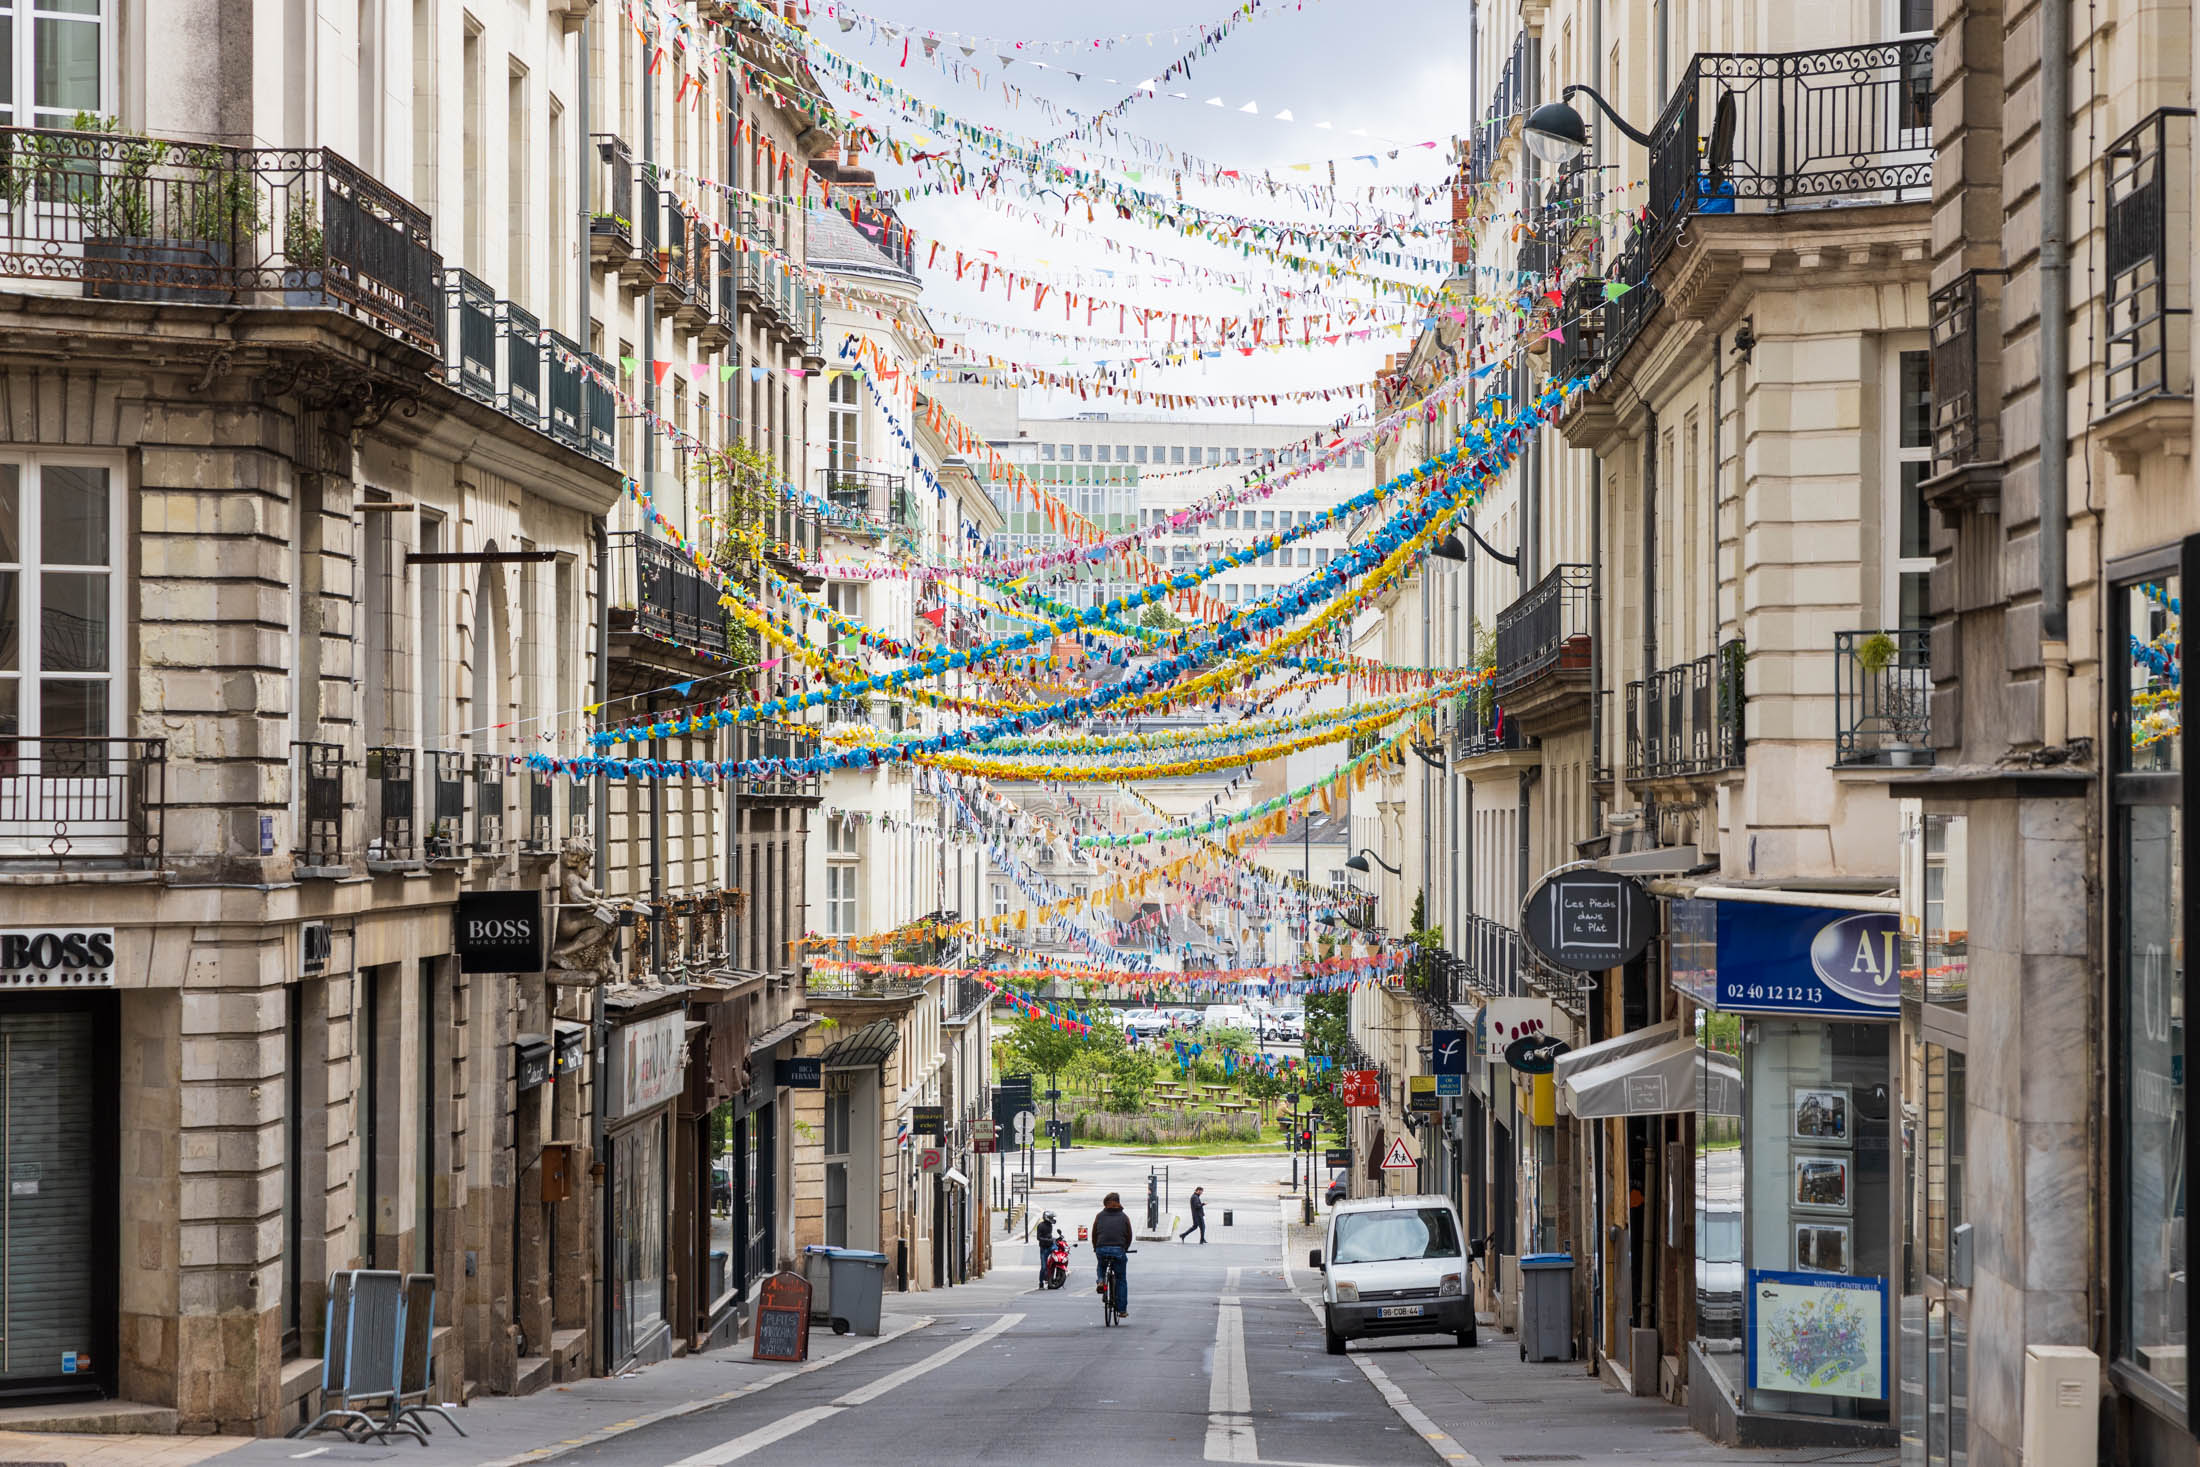 Jean-Jacques Rousseau street in Nantes has been decorated with many garlands by its inhabitants. Nantes, France - May 1st 2020.La rue Jean-Jacques Rousseau a ete decoree de nombreuses guirlandes par ses habitants. Nantes, France - 1er Mai 2020.